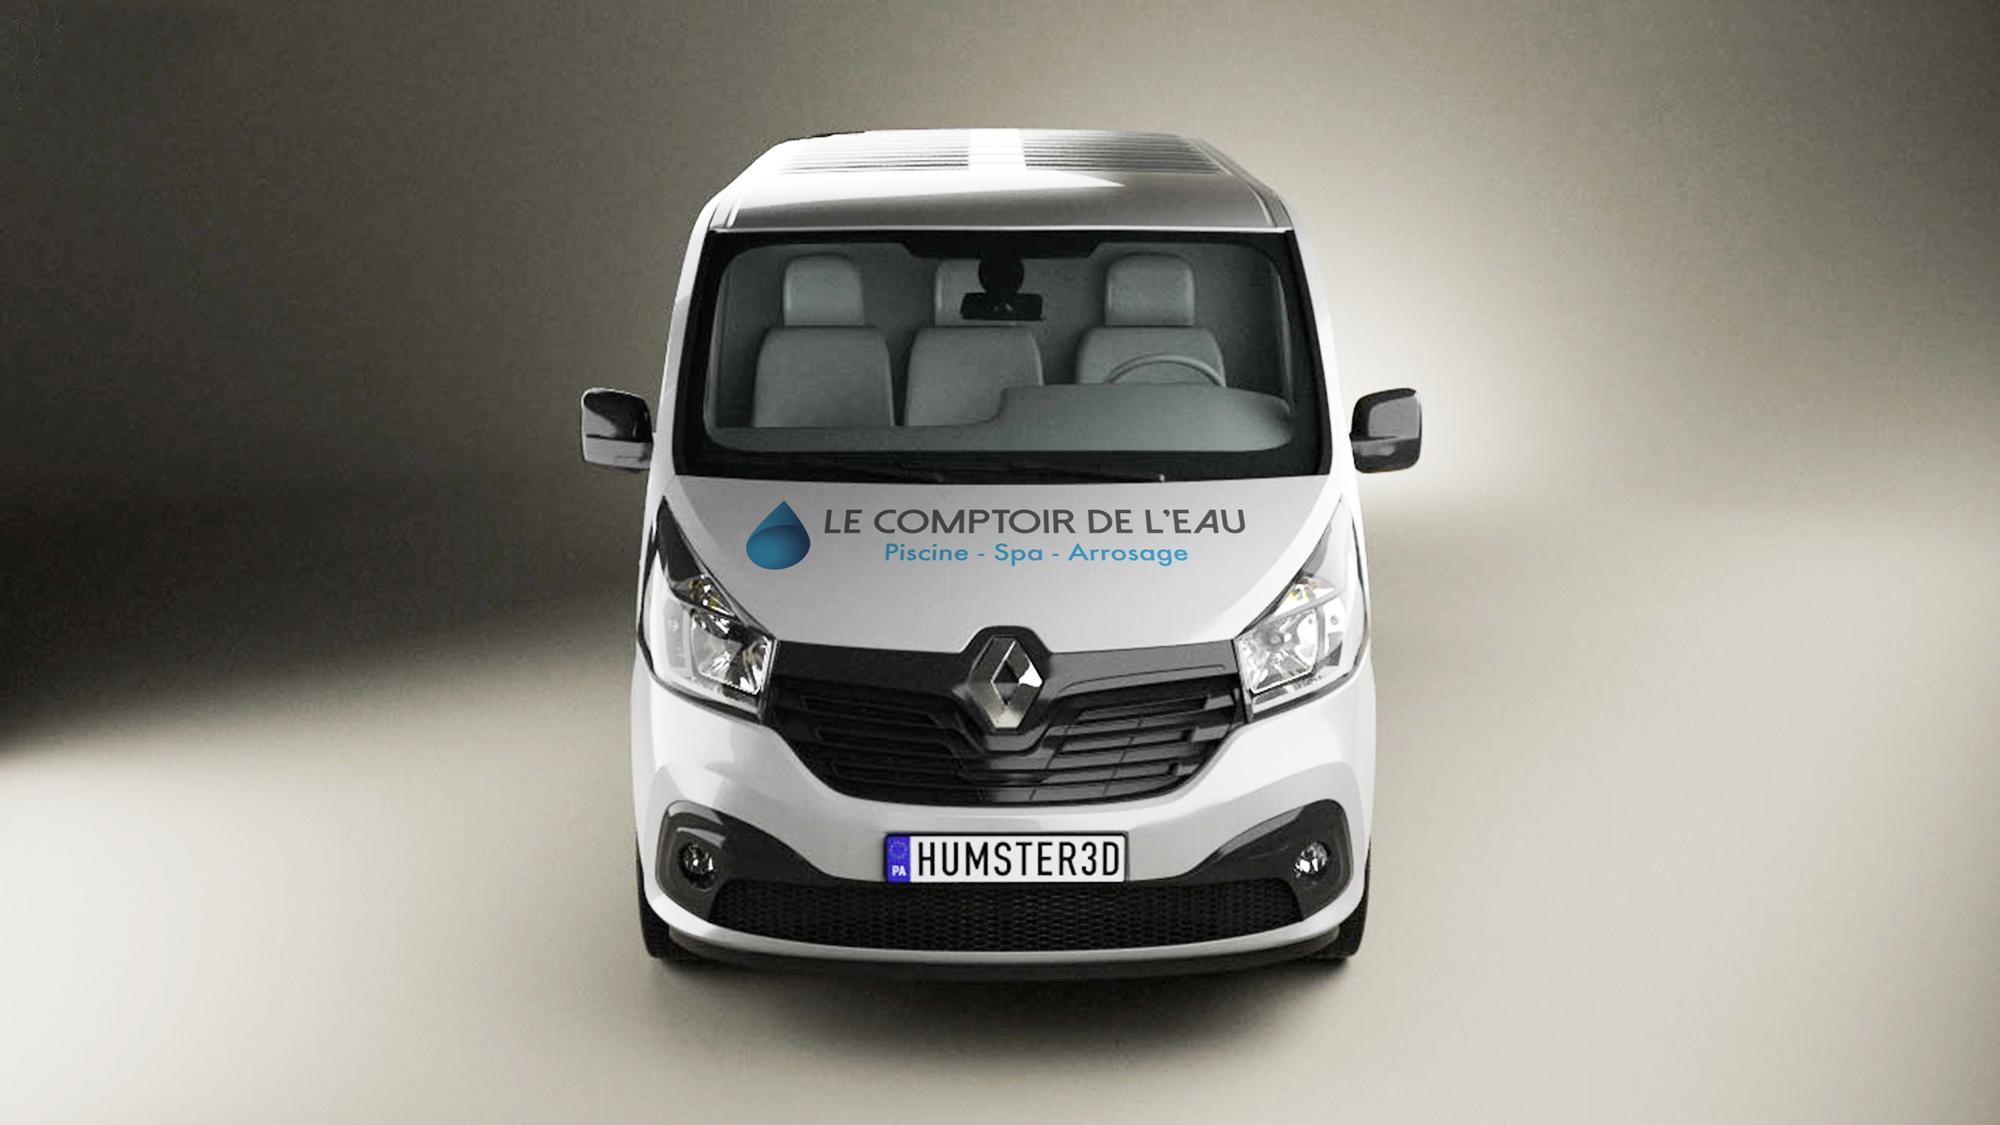 Mockup-Trafic-ComptoirEau-avant